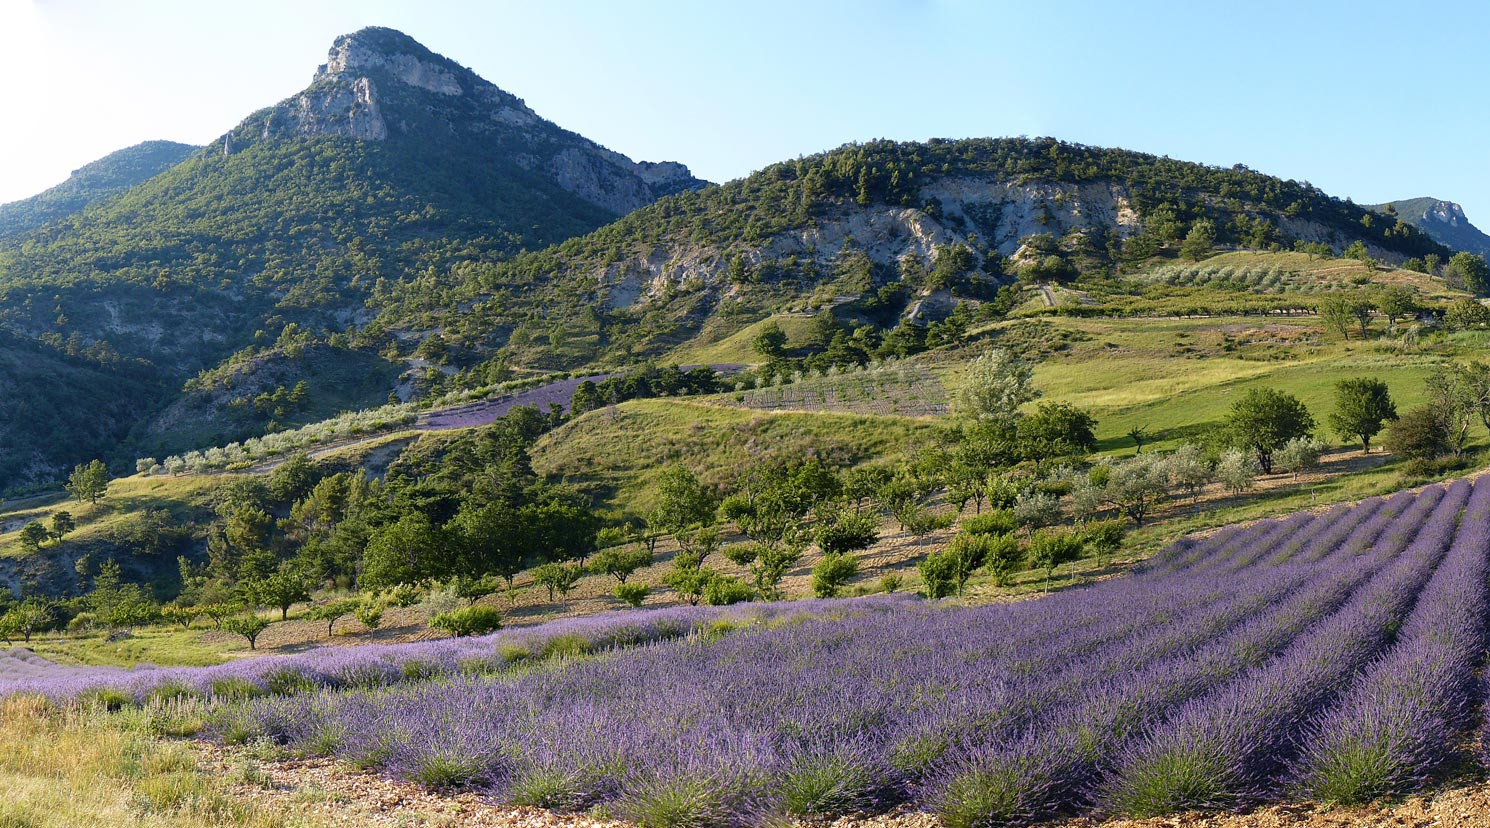 La vallée de Sainte Jalle